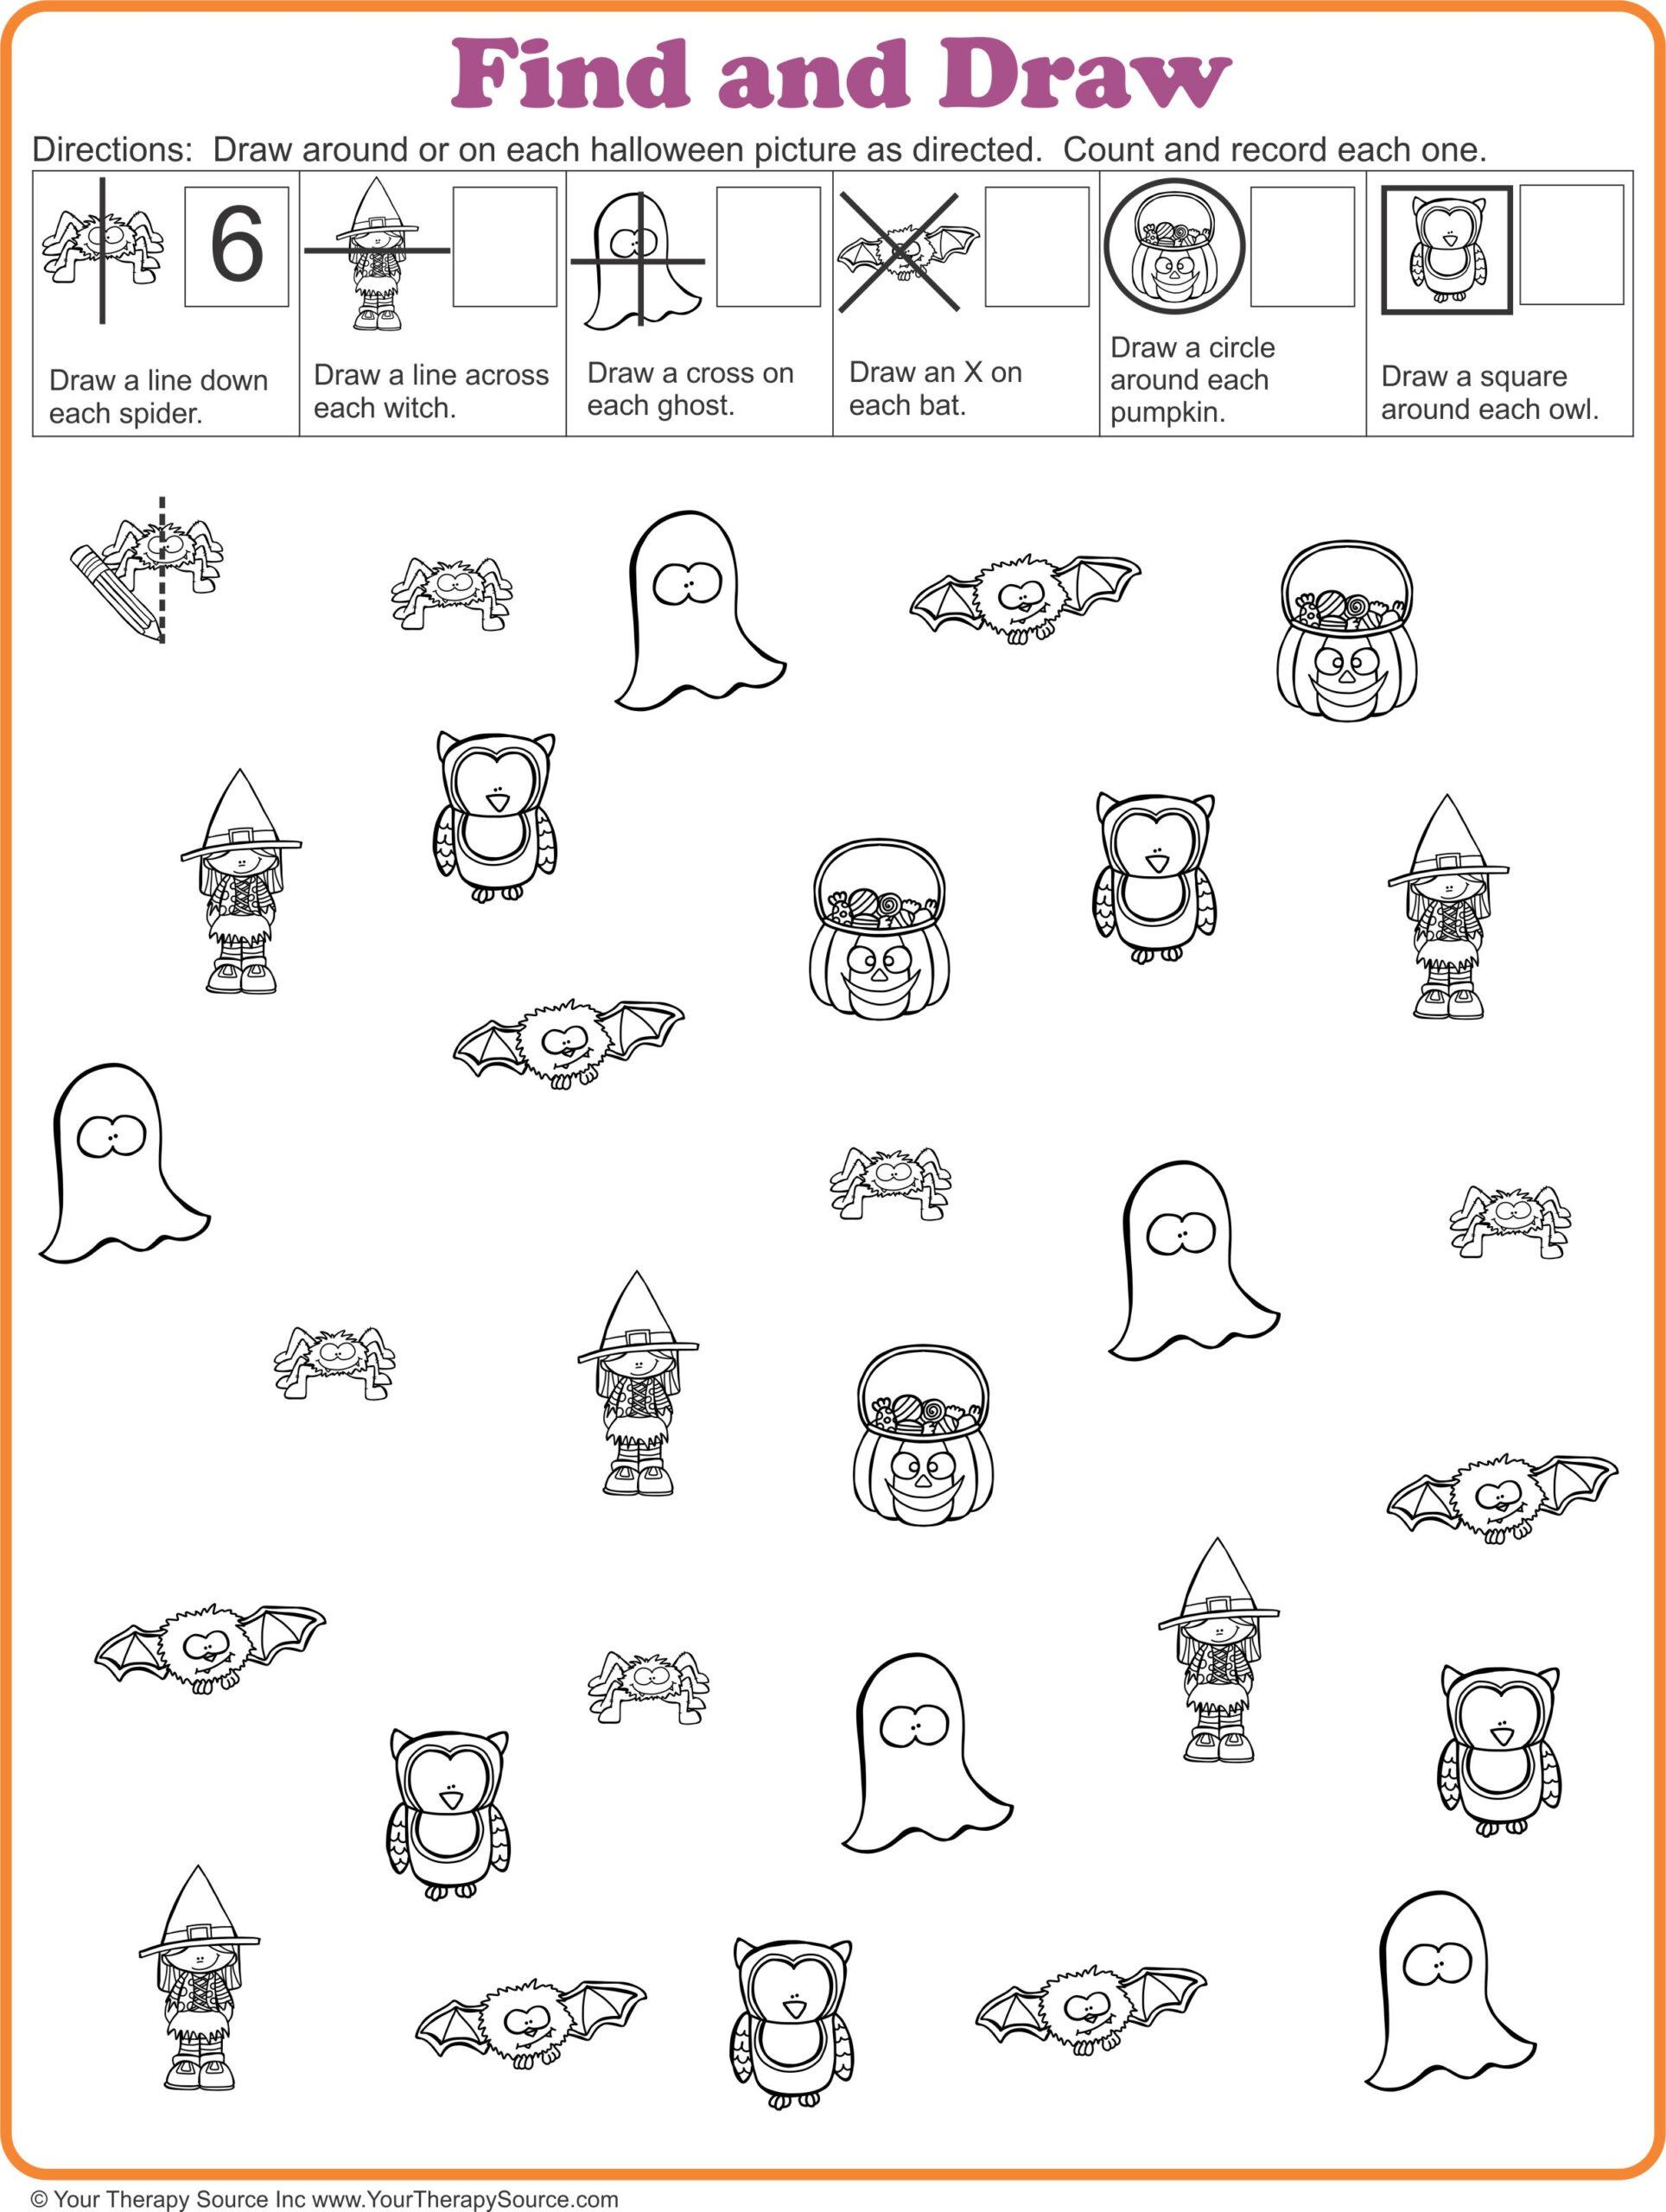 16 Free Halloween Printables - Sensory Motor Skills - Your